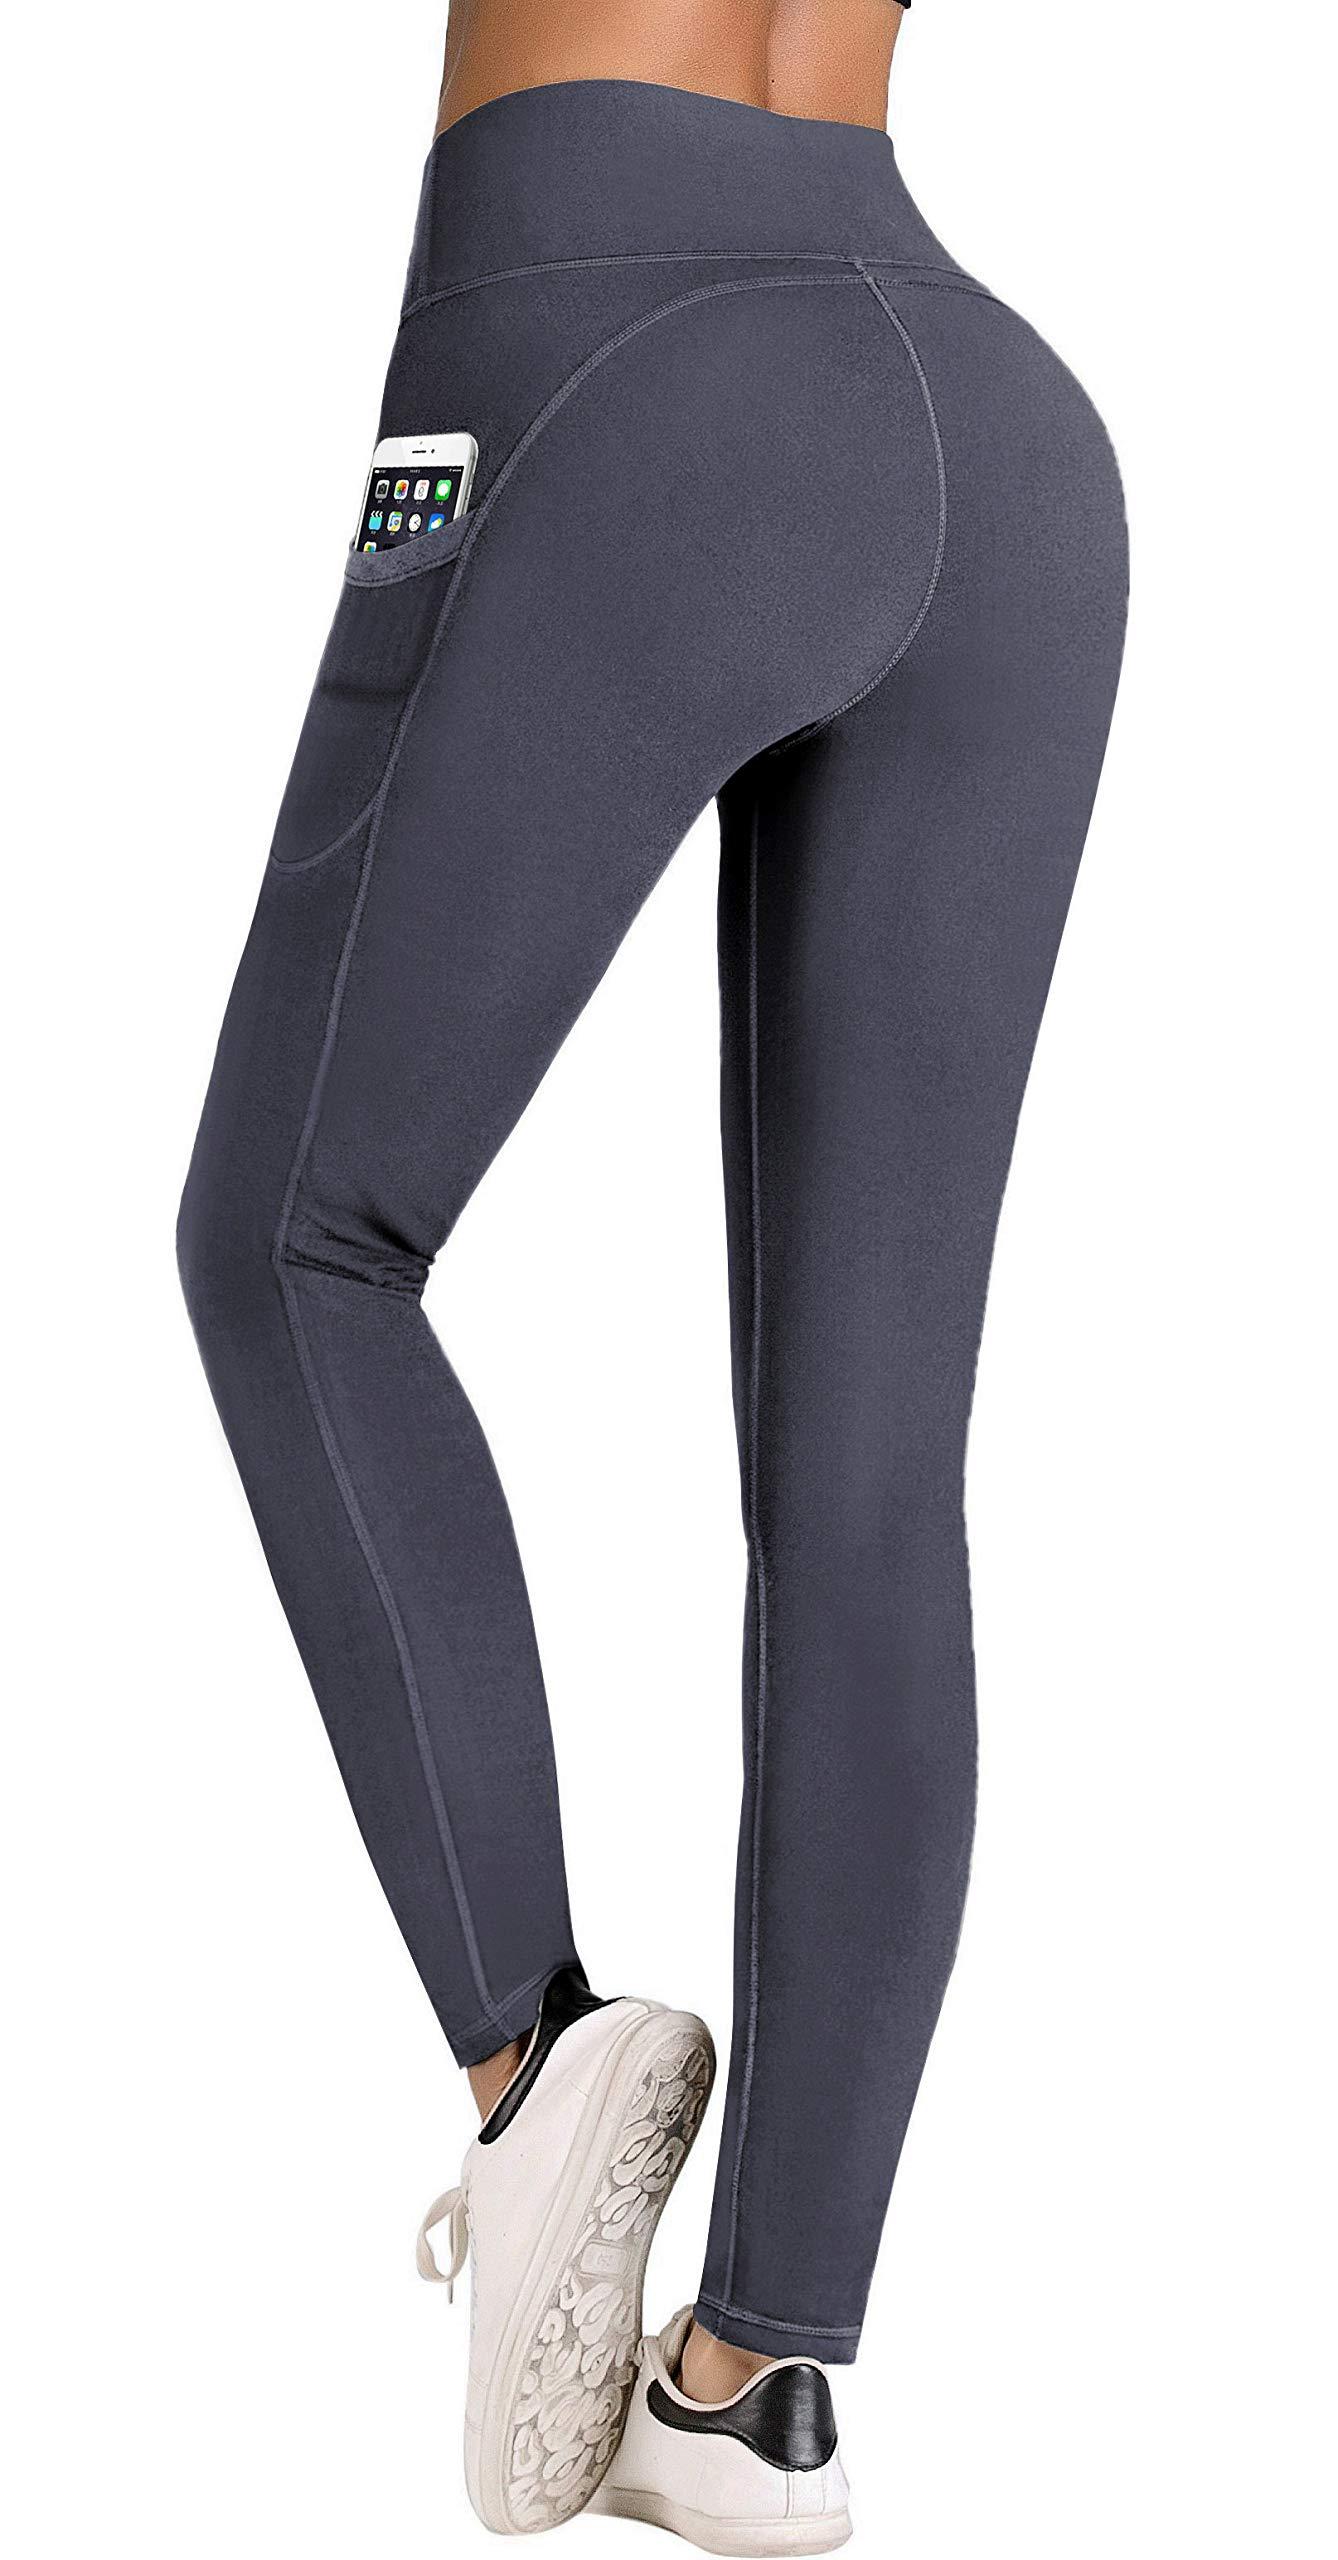 IUGA High Waist Yoga Pants Shorts with Pockets Tummy Control Workout Yoga Shorts Side Pockets (7840 Gray, X-Small)